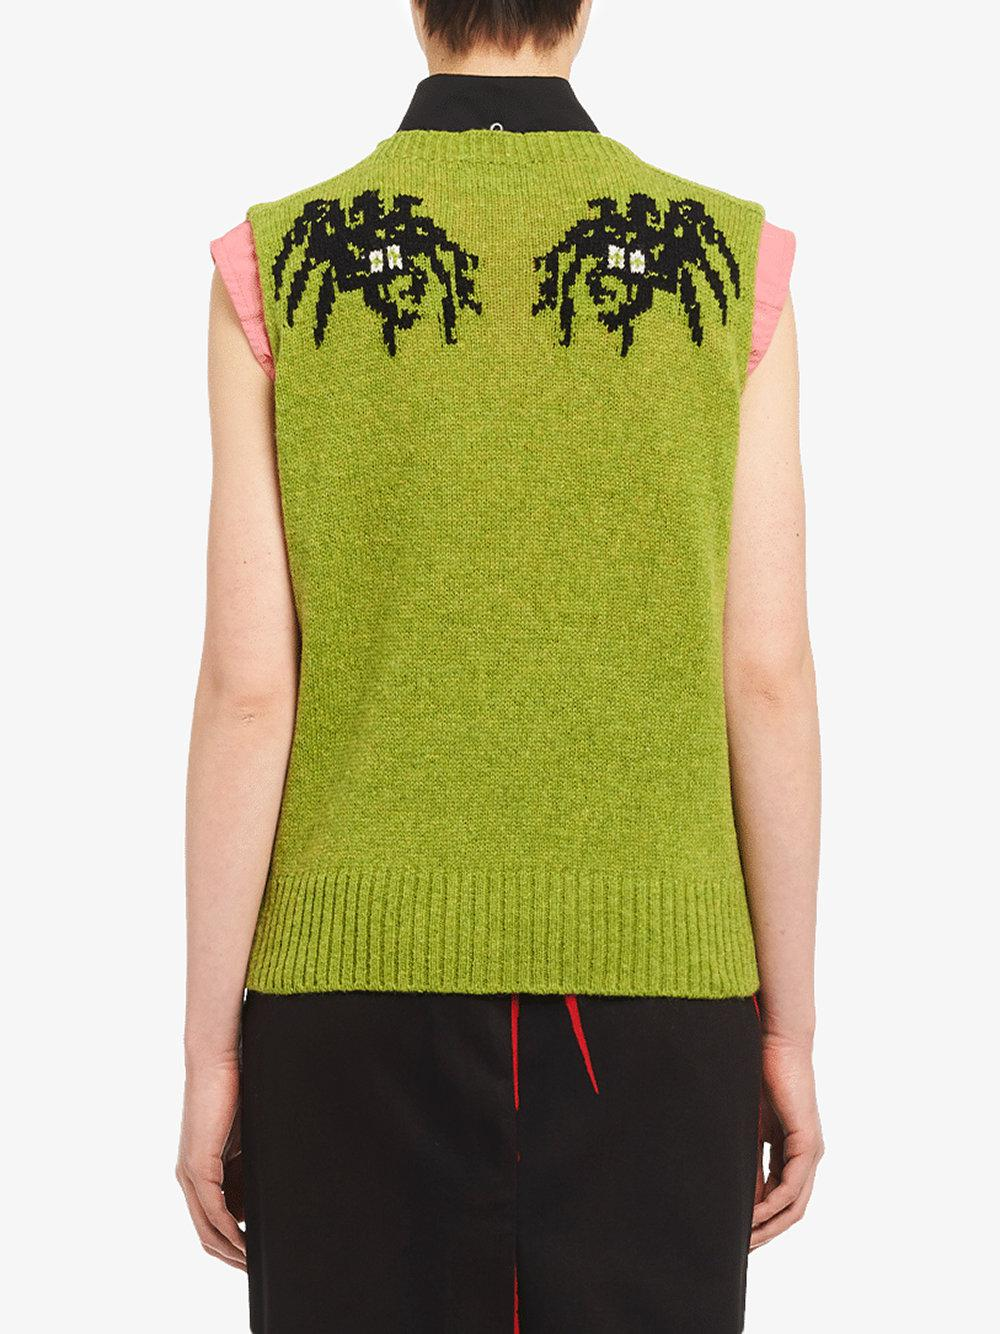 7f61f5fe0 Lyst - Prada Spider Intarsia Vest in Green